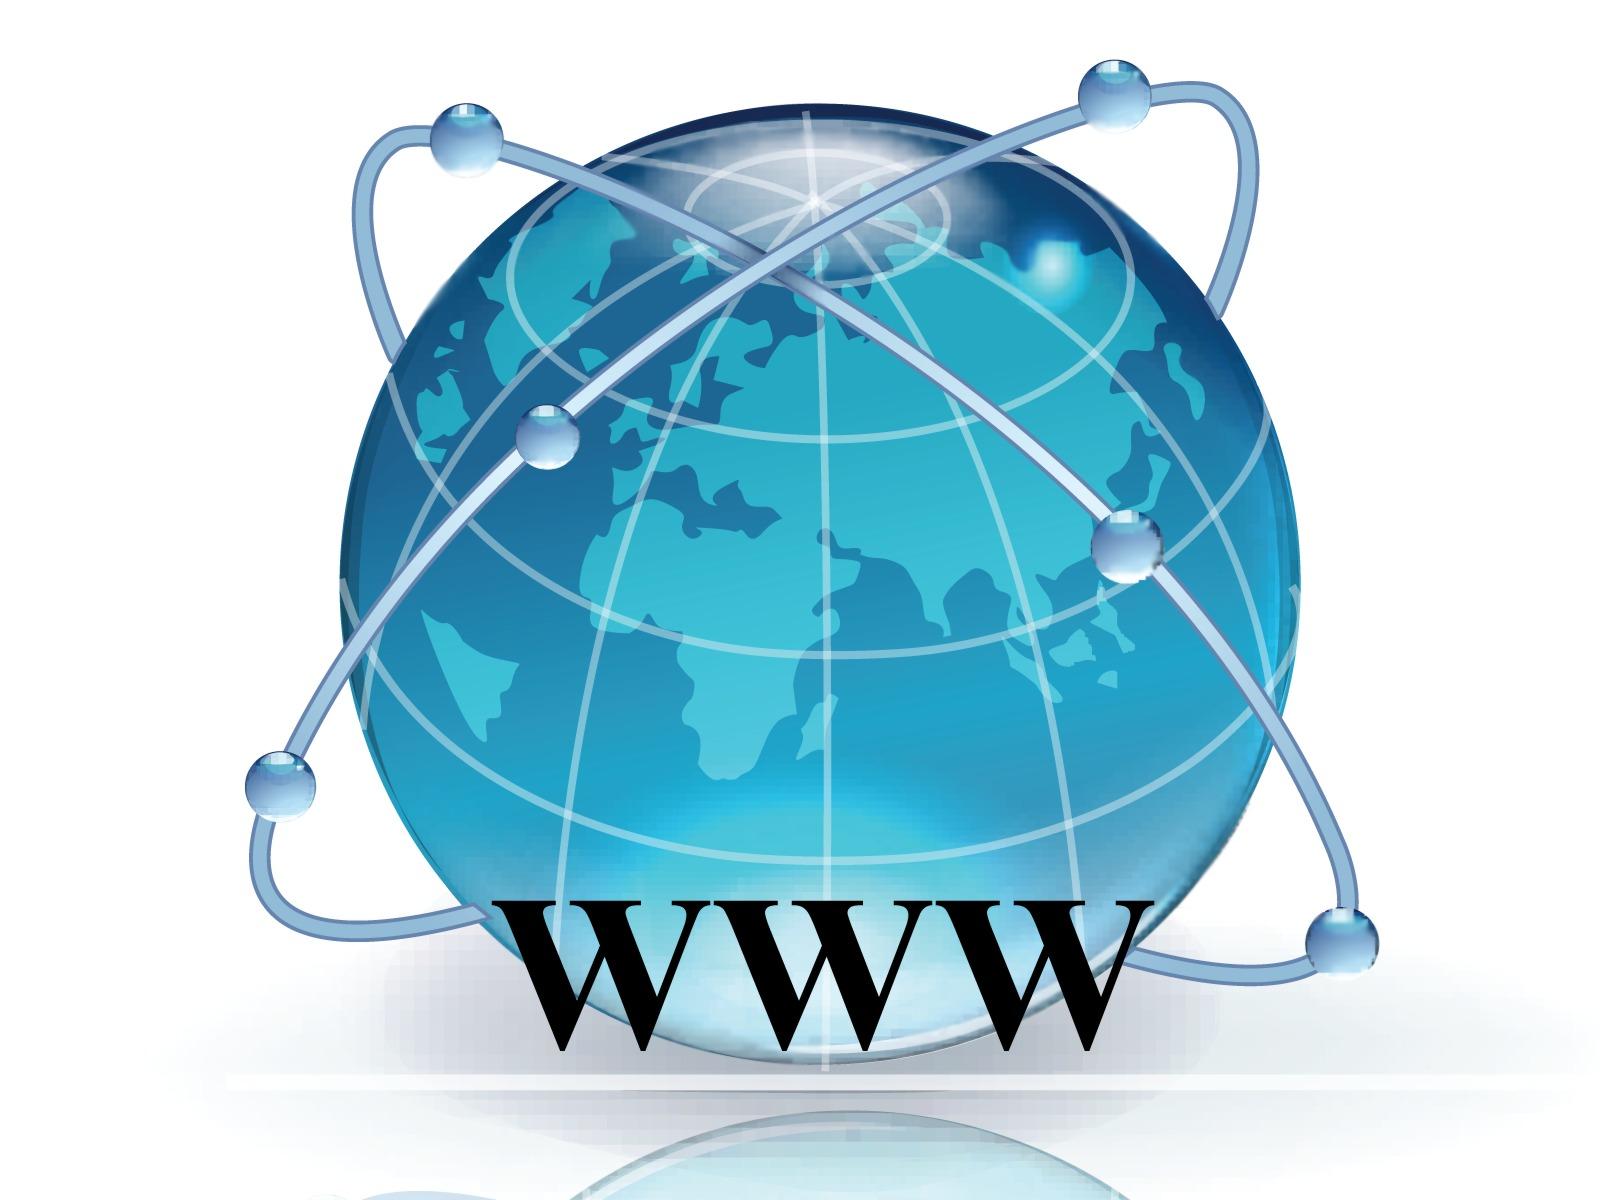 World Wide Web by e-designer on DeviantArt